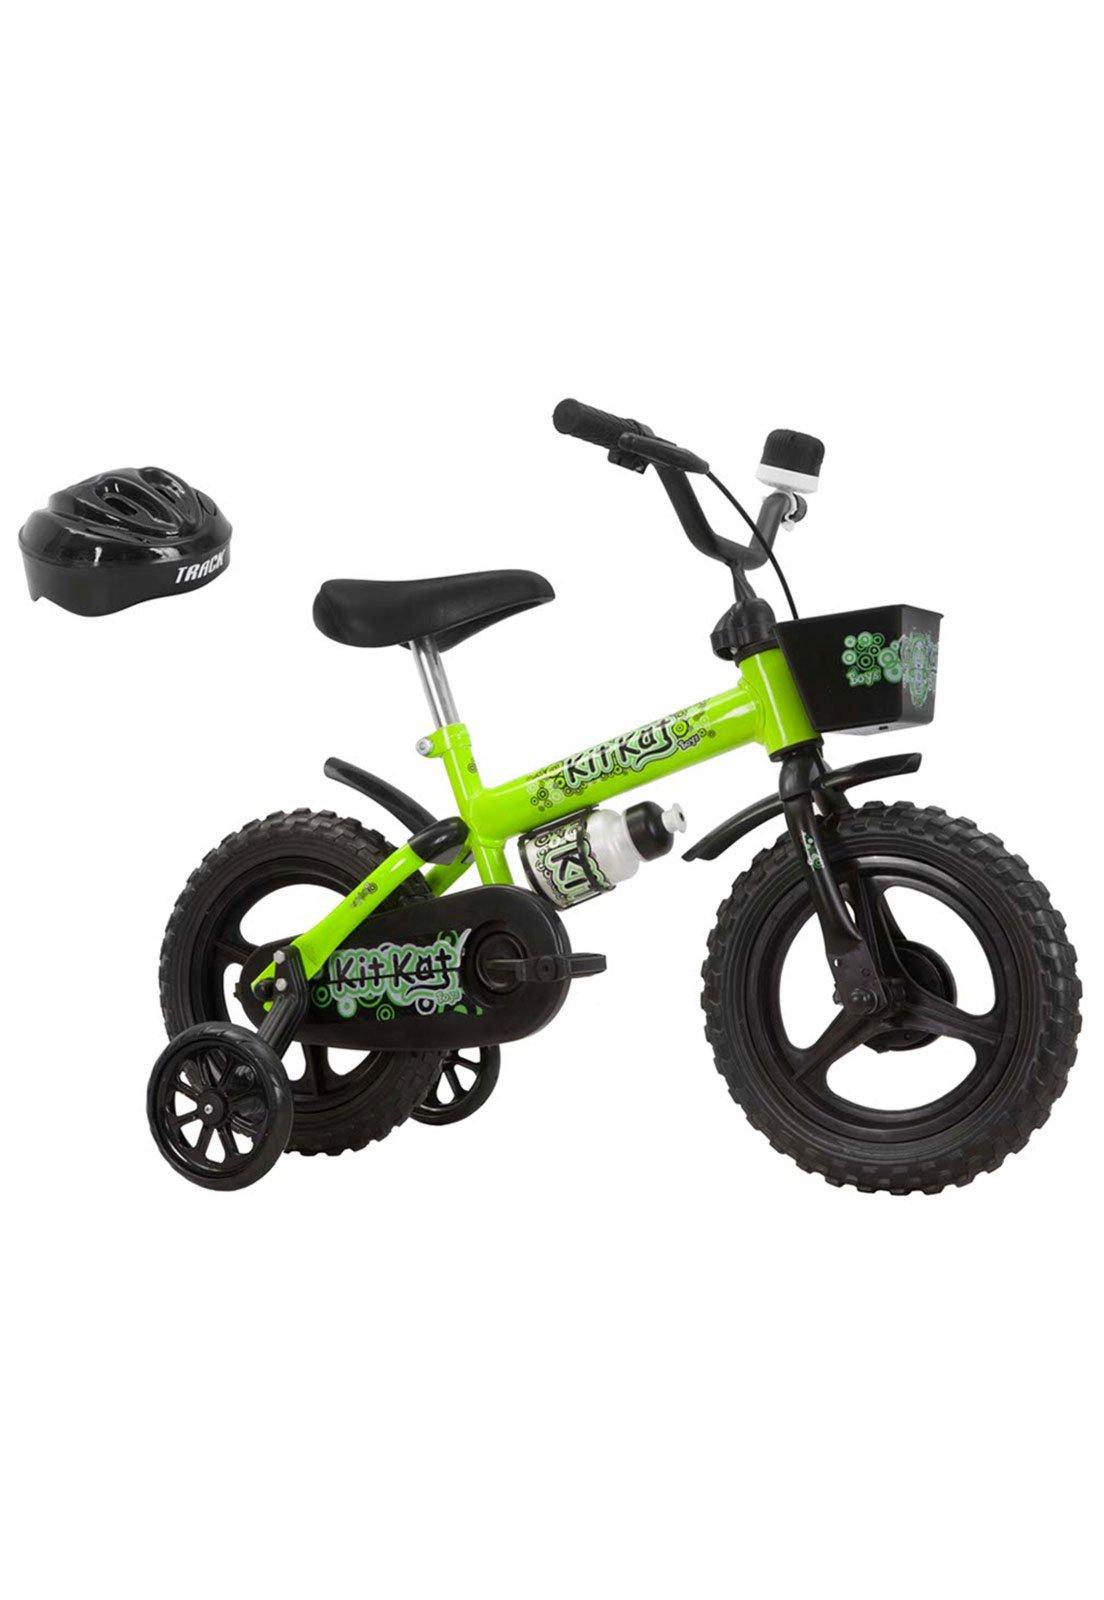 4a4c9c668 Bicicleta Aro 12 Kitkat Com Capacete Amarelo-Neon Track   Bikes - Compre  Agora